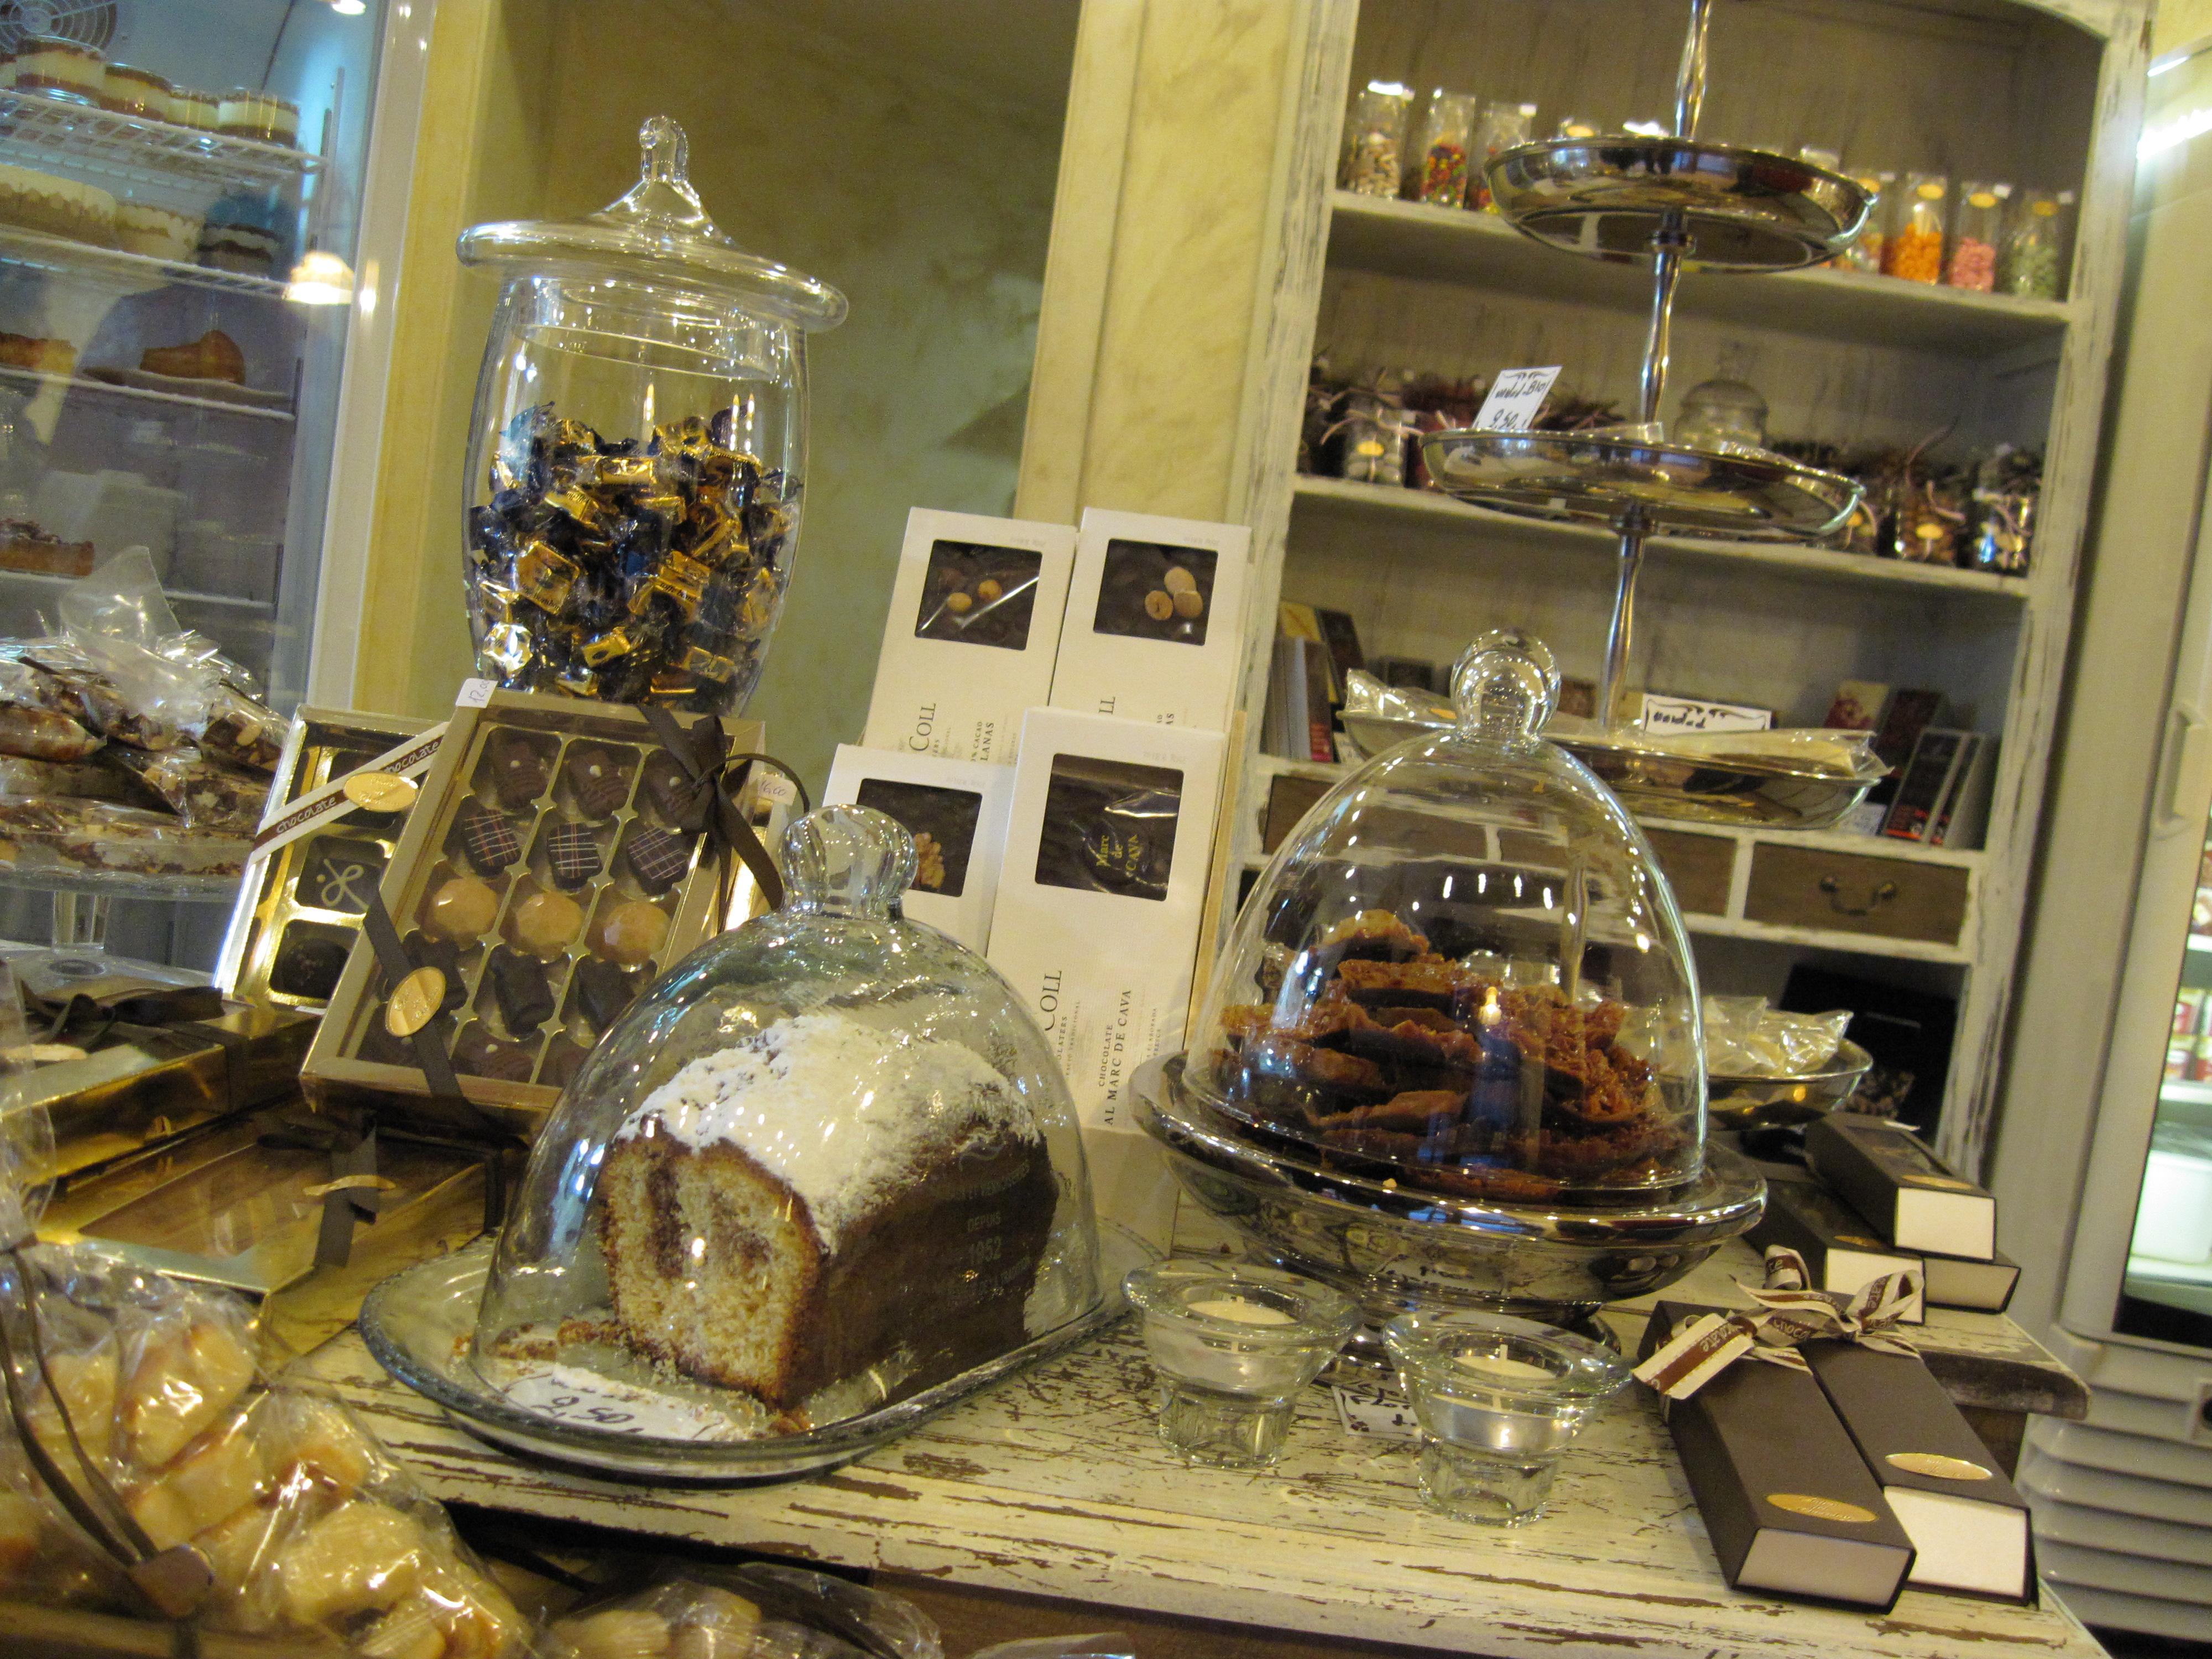 Pastry shop photo